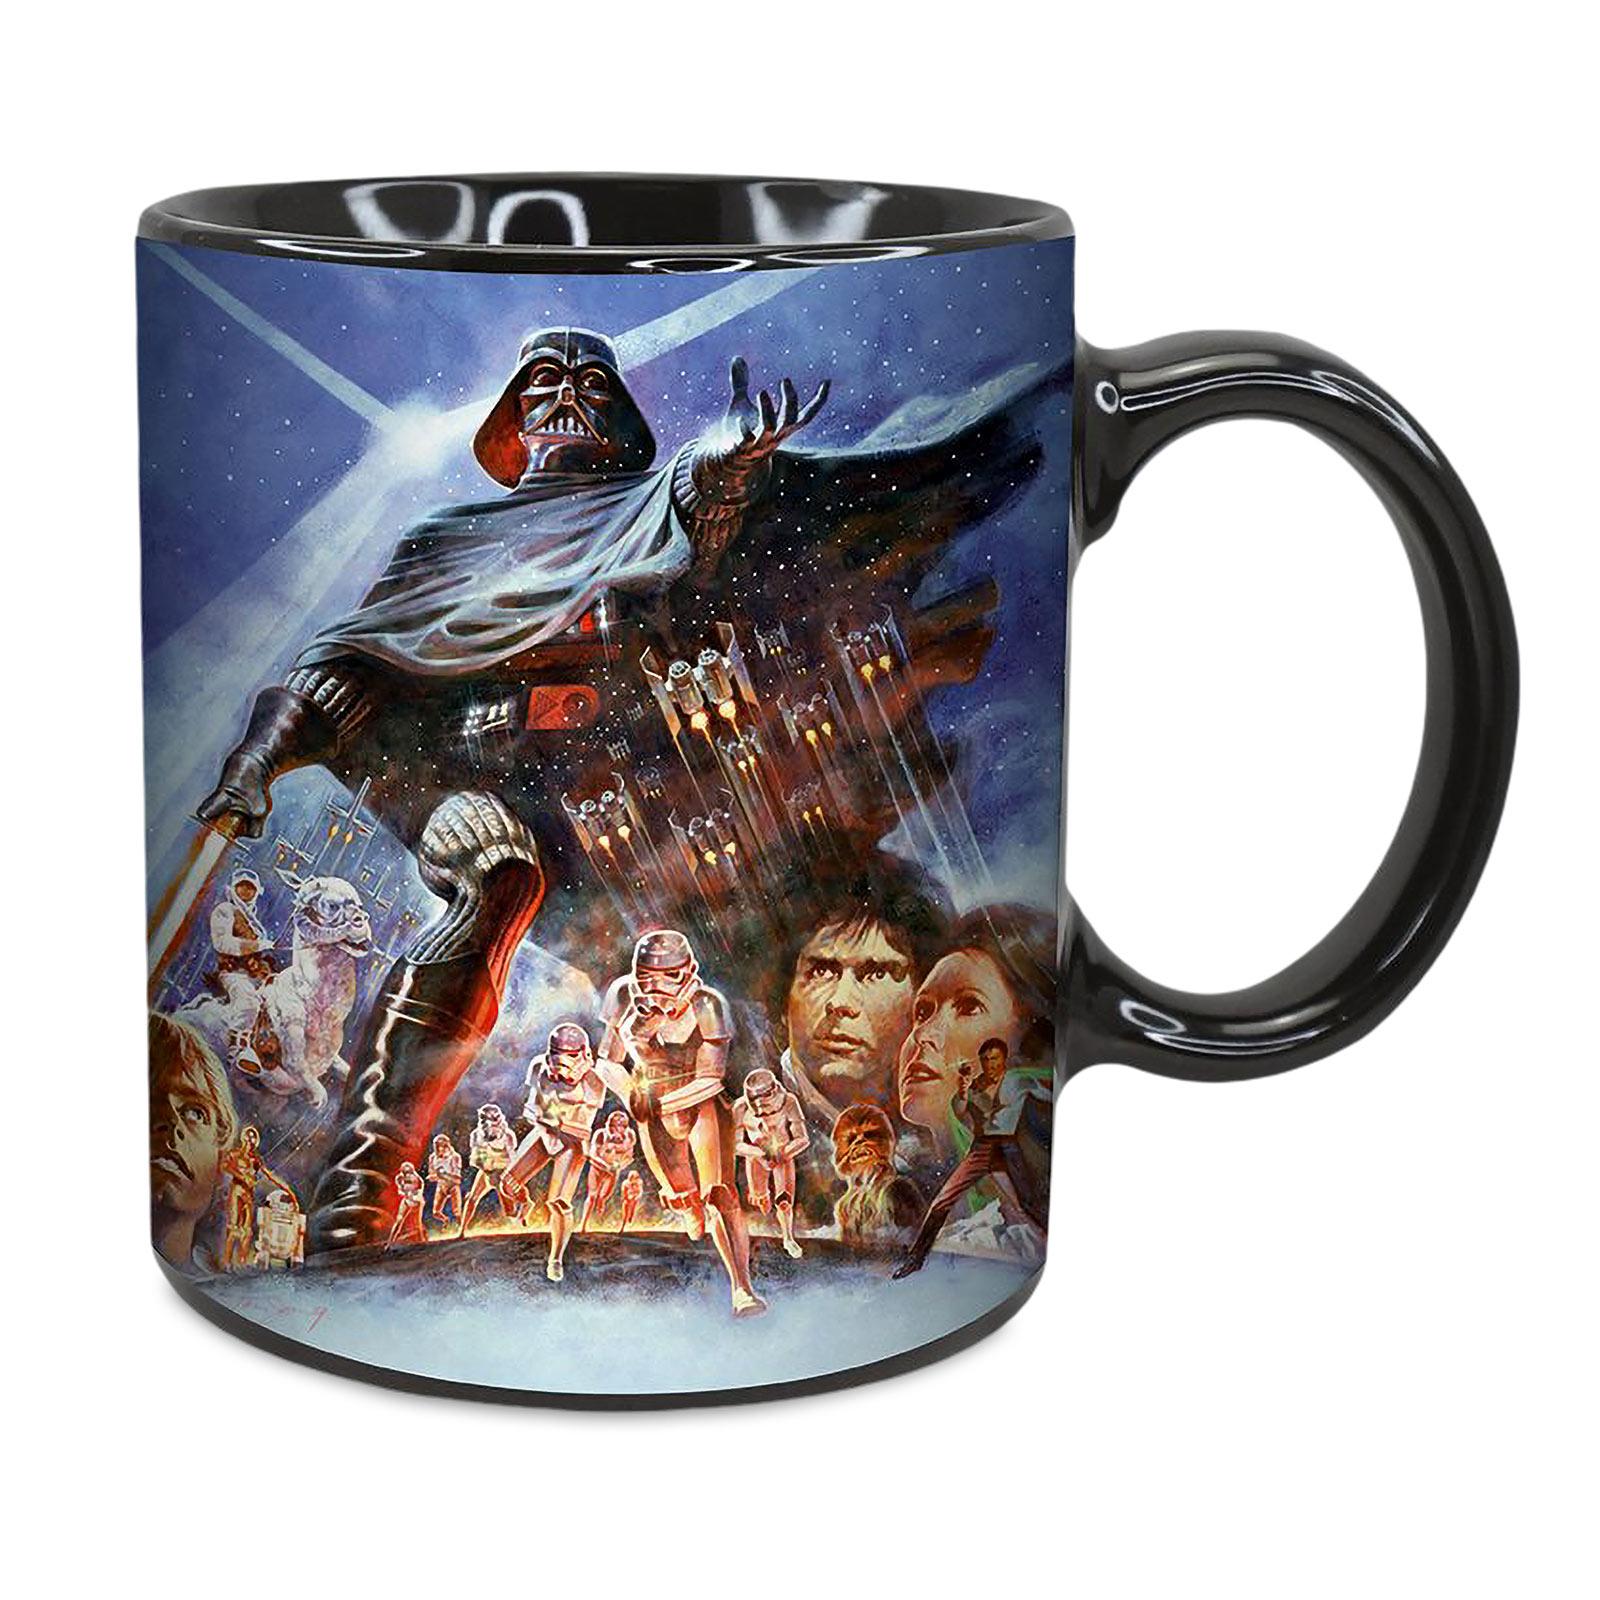 Star Wars - The Empire Strikes Back Tasse